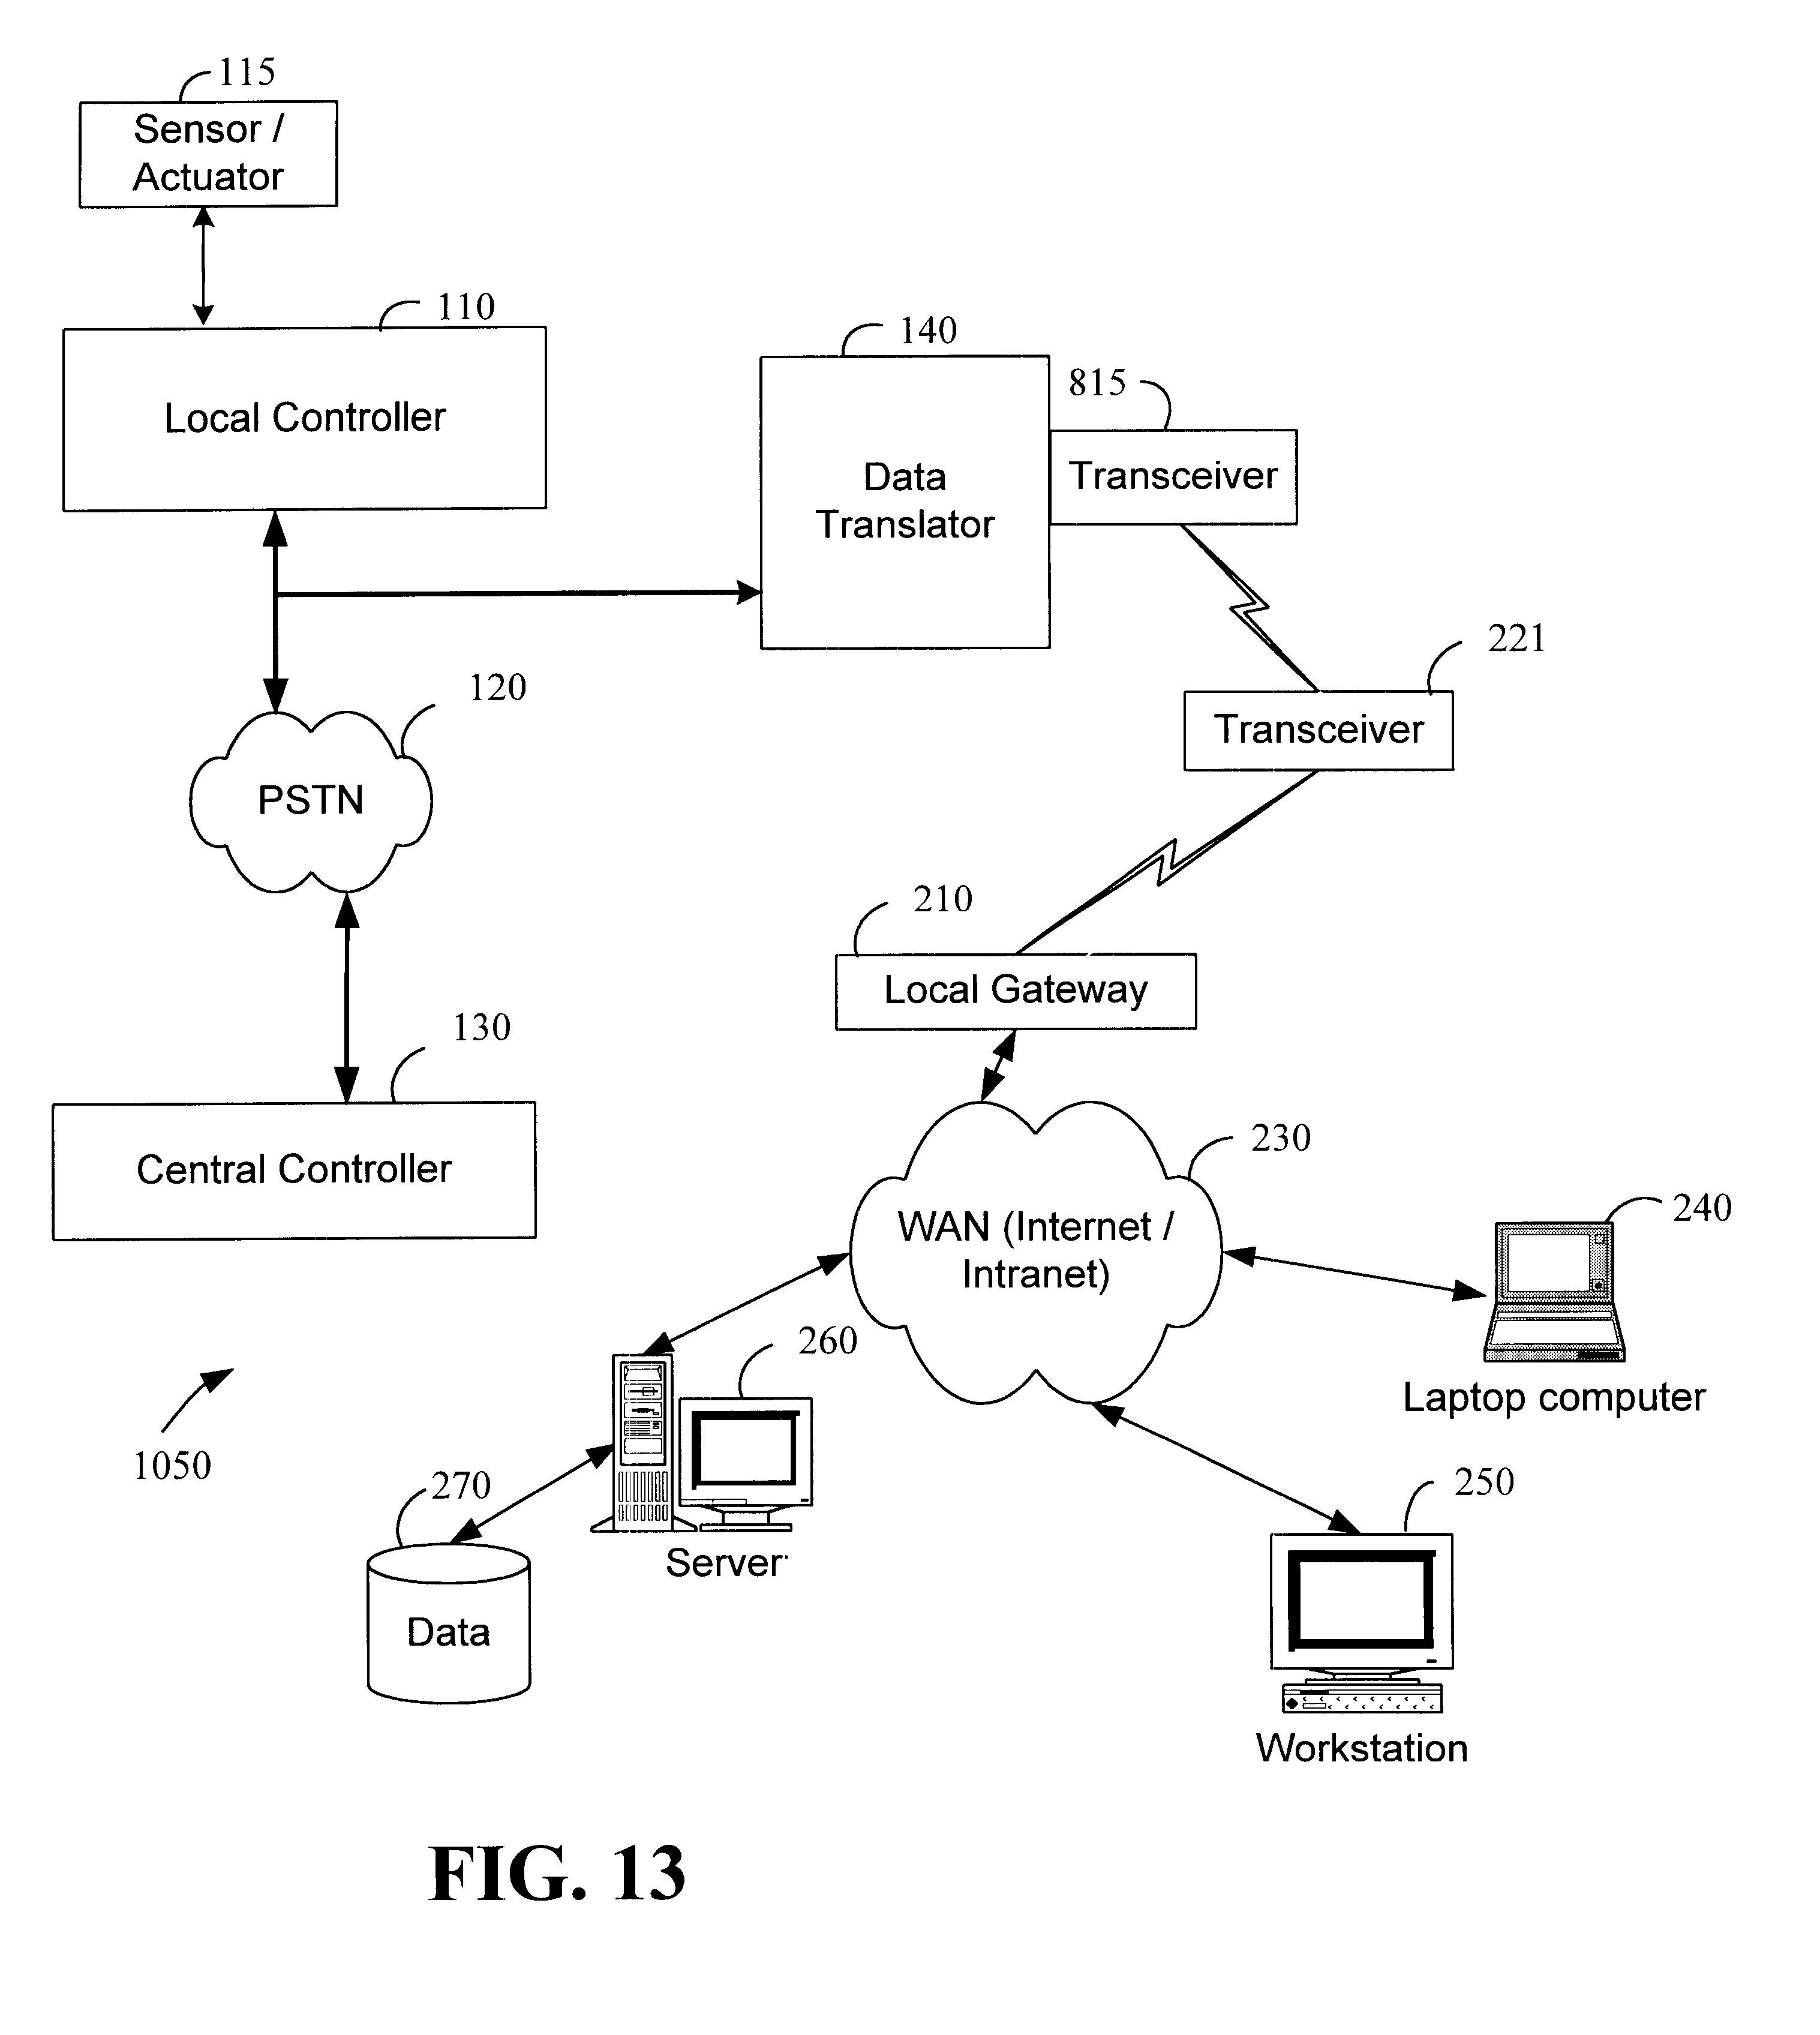 patent us 6 437 692 b1 Zone Valve Wiring Diagram litigations